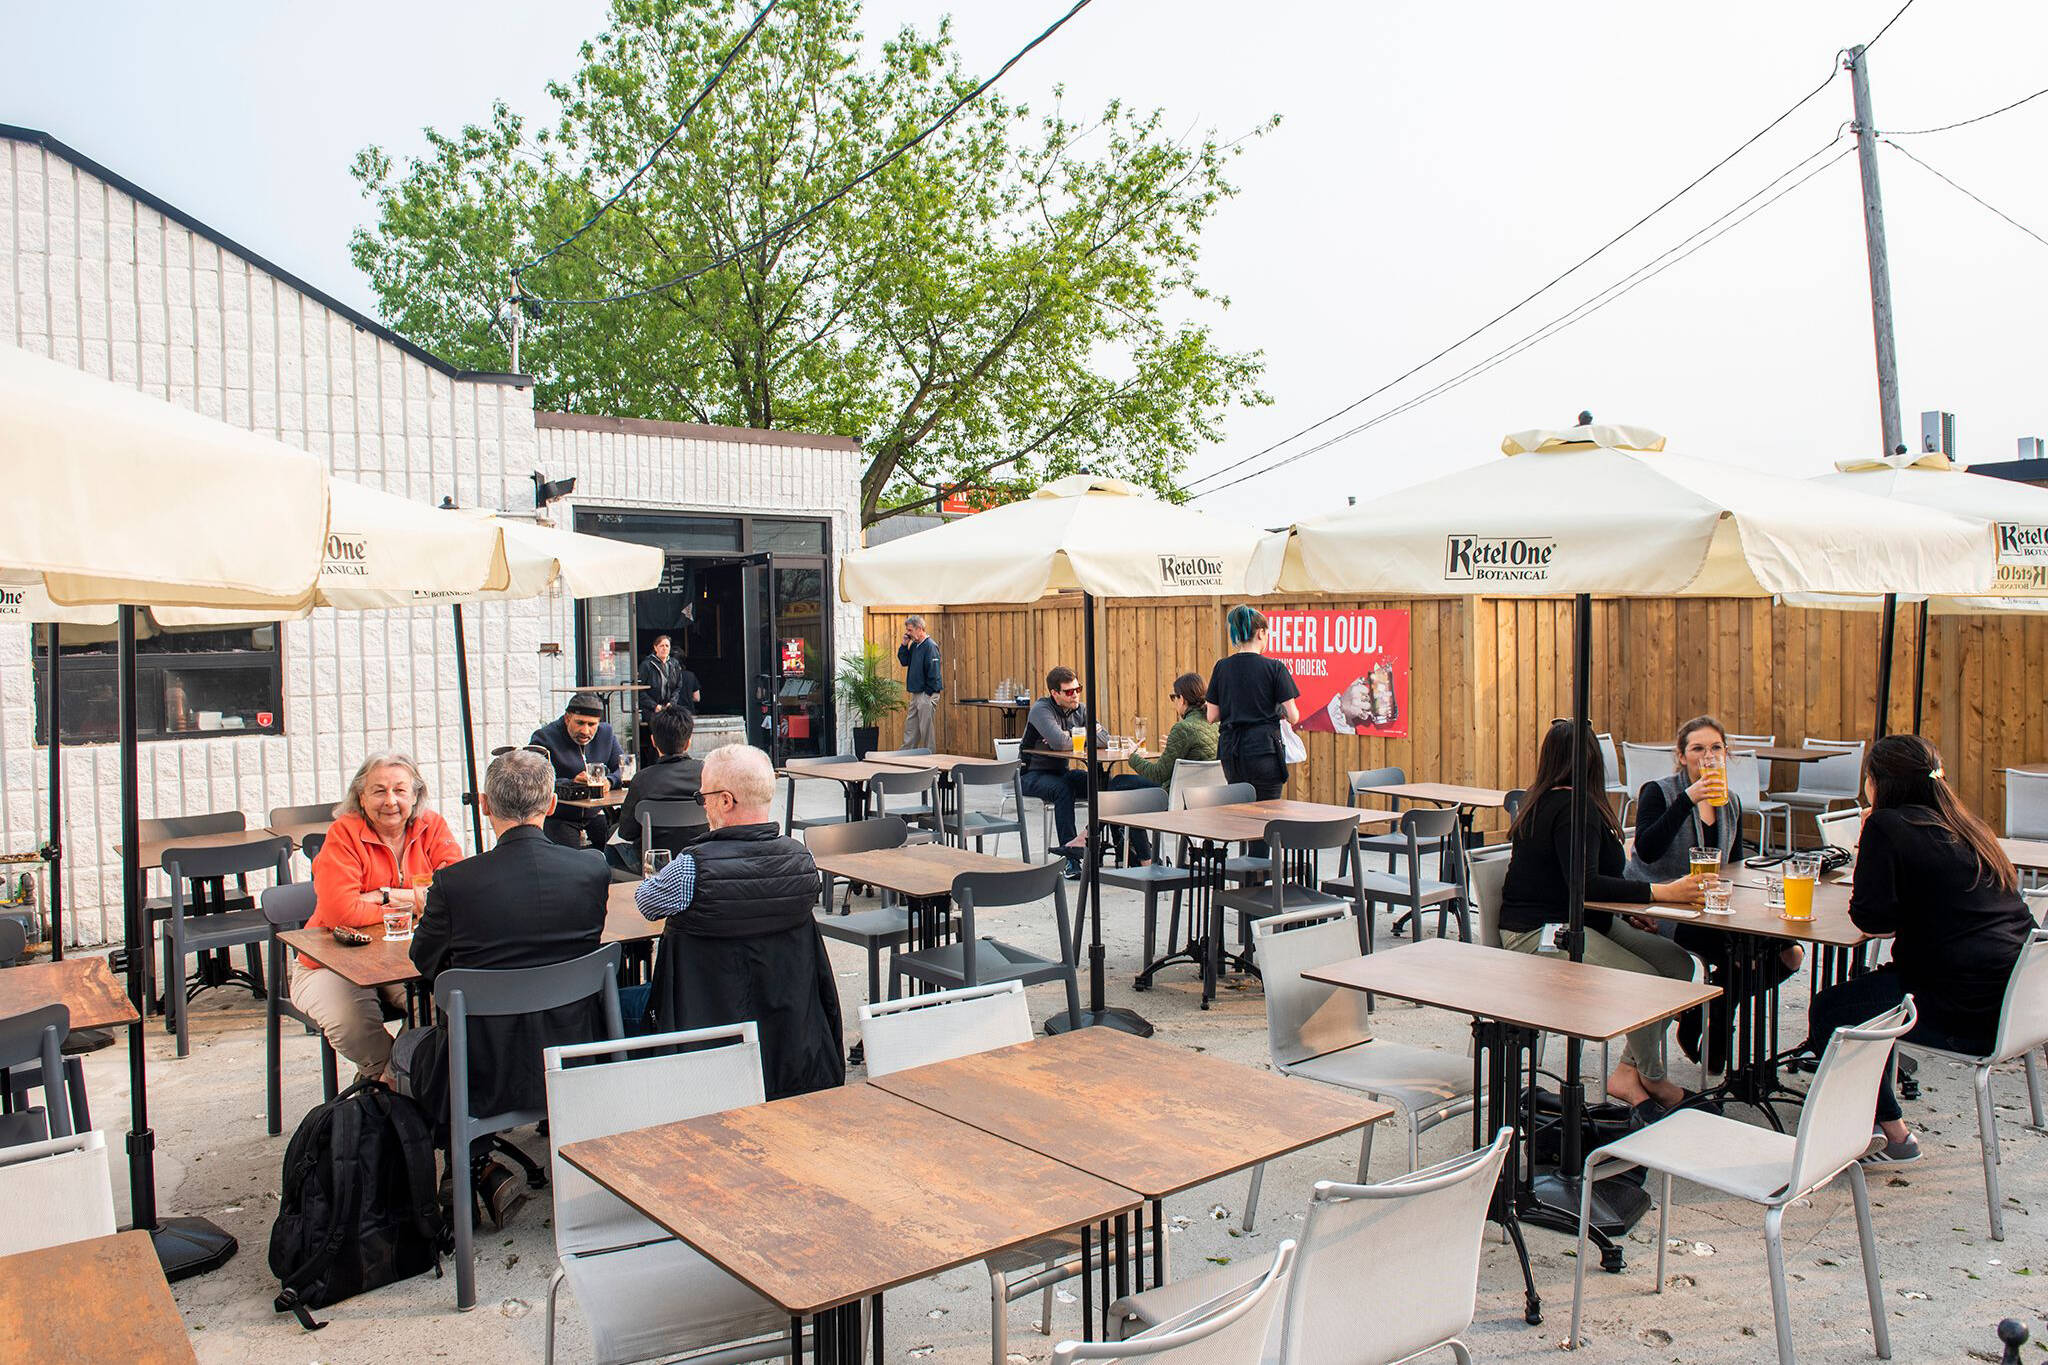 patios open in toronto